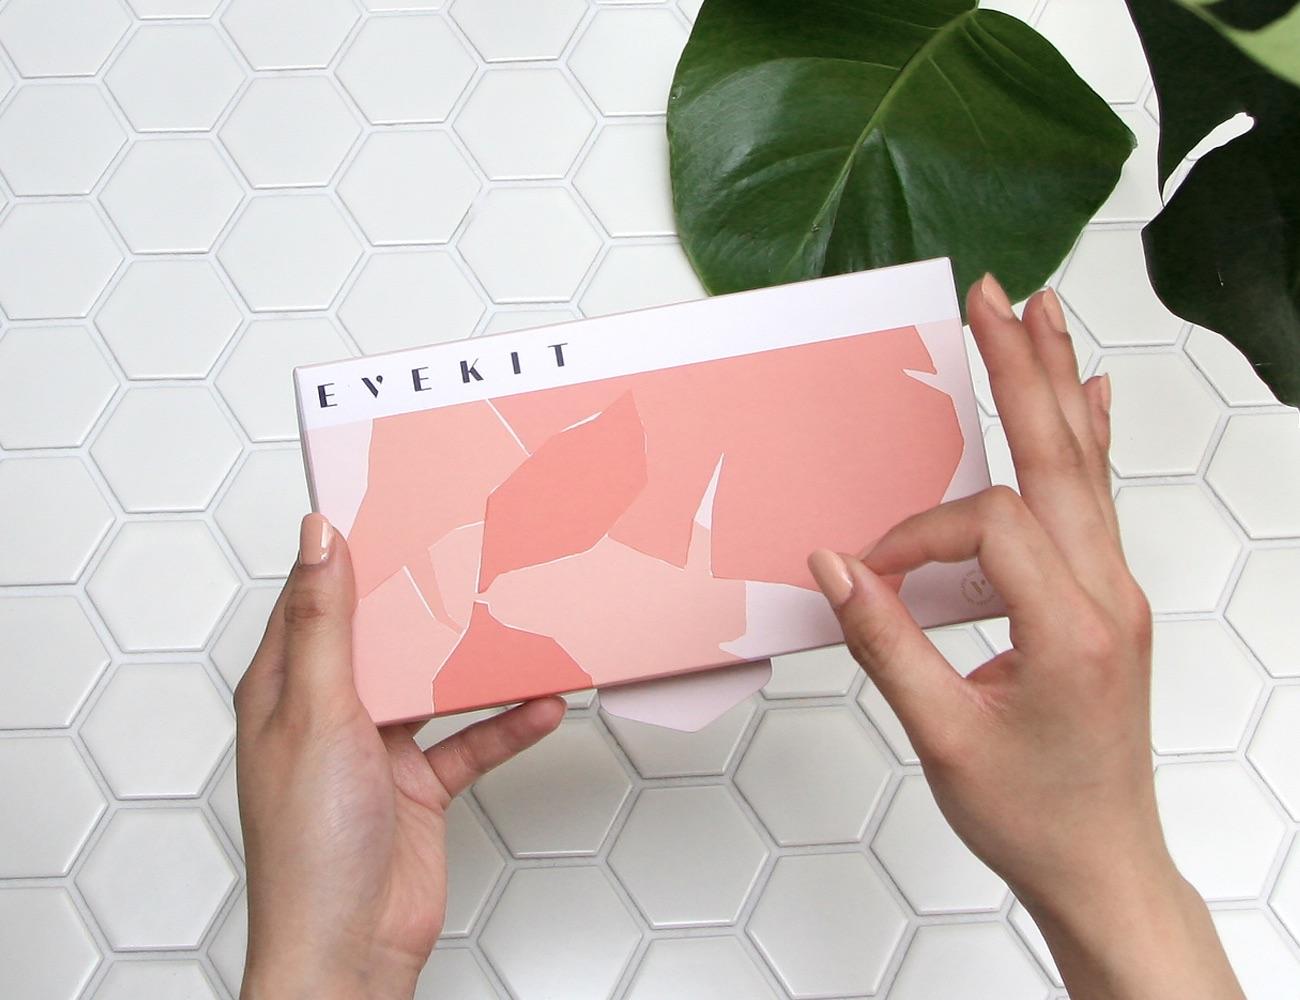 Eve Kit – Prevention Made Easy